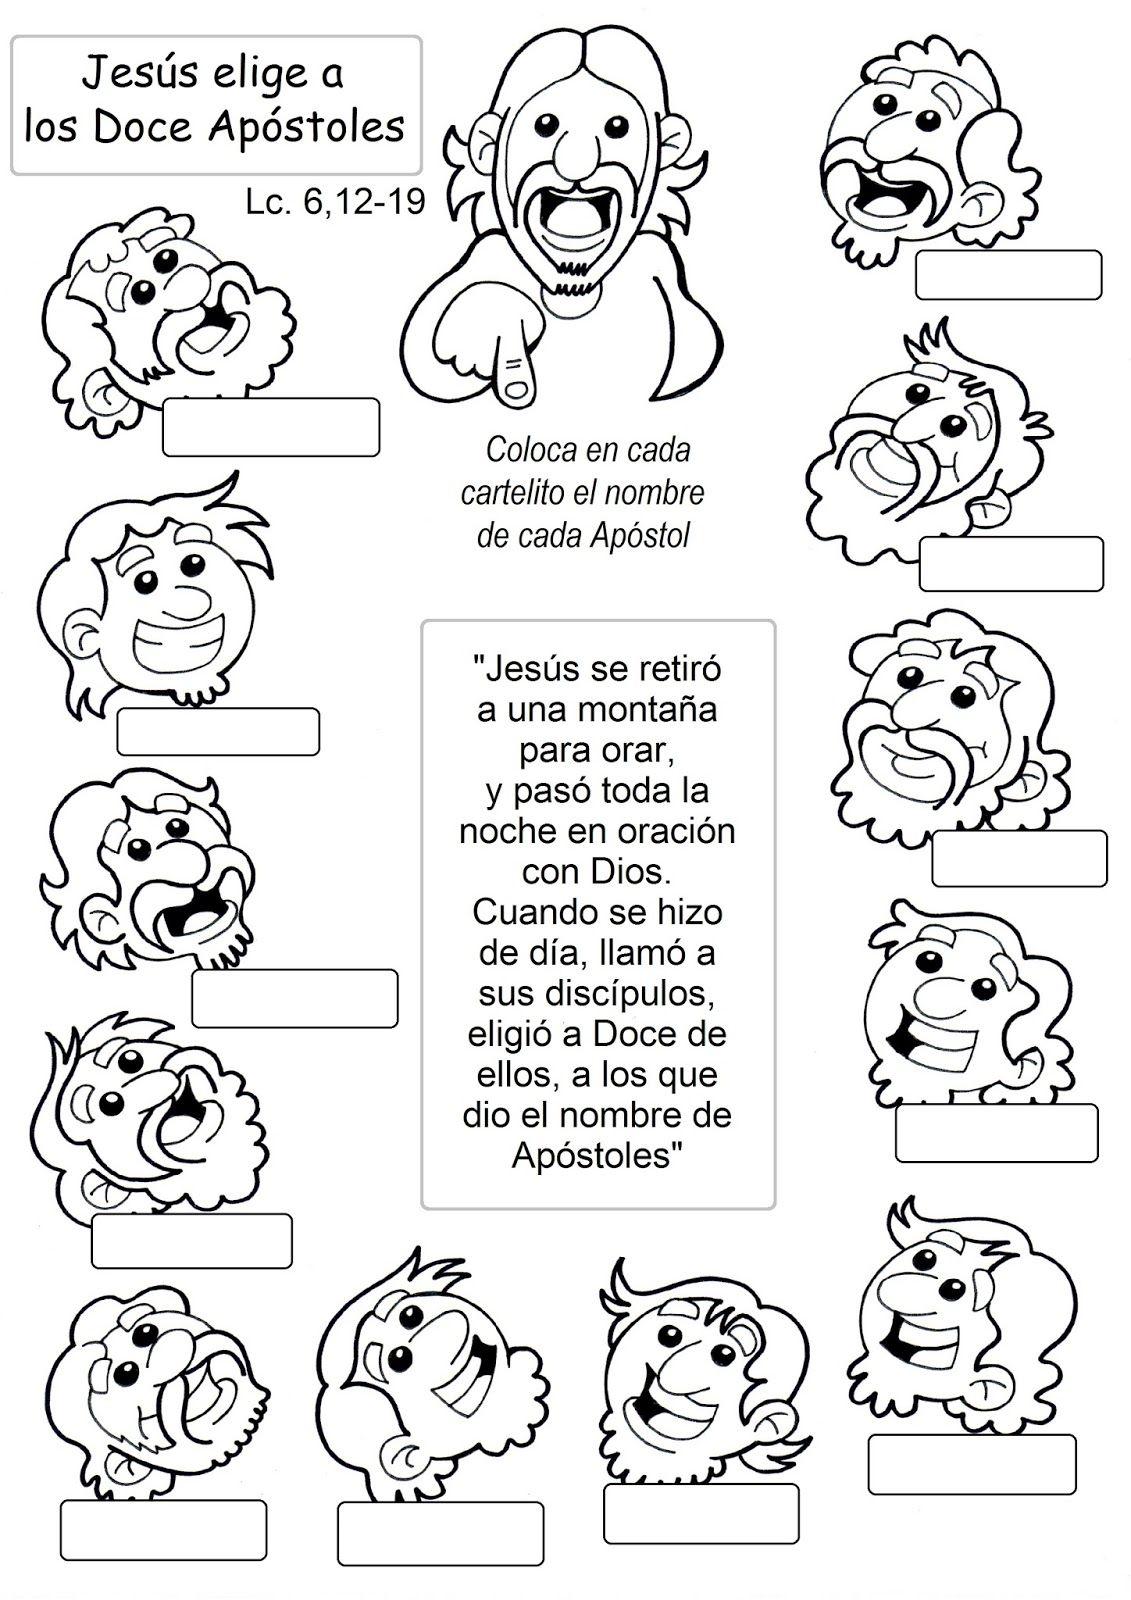 Apostoles3 | NiñOs iGle!!! | Pinterest | Dominical, Escuela ...